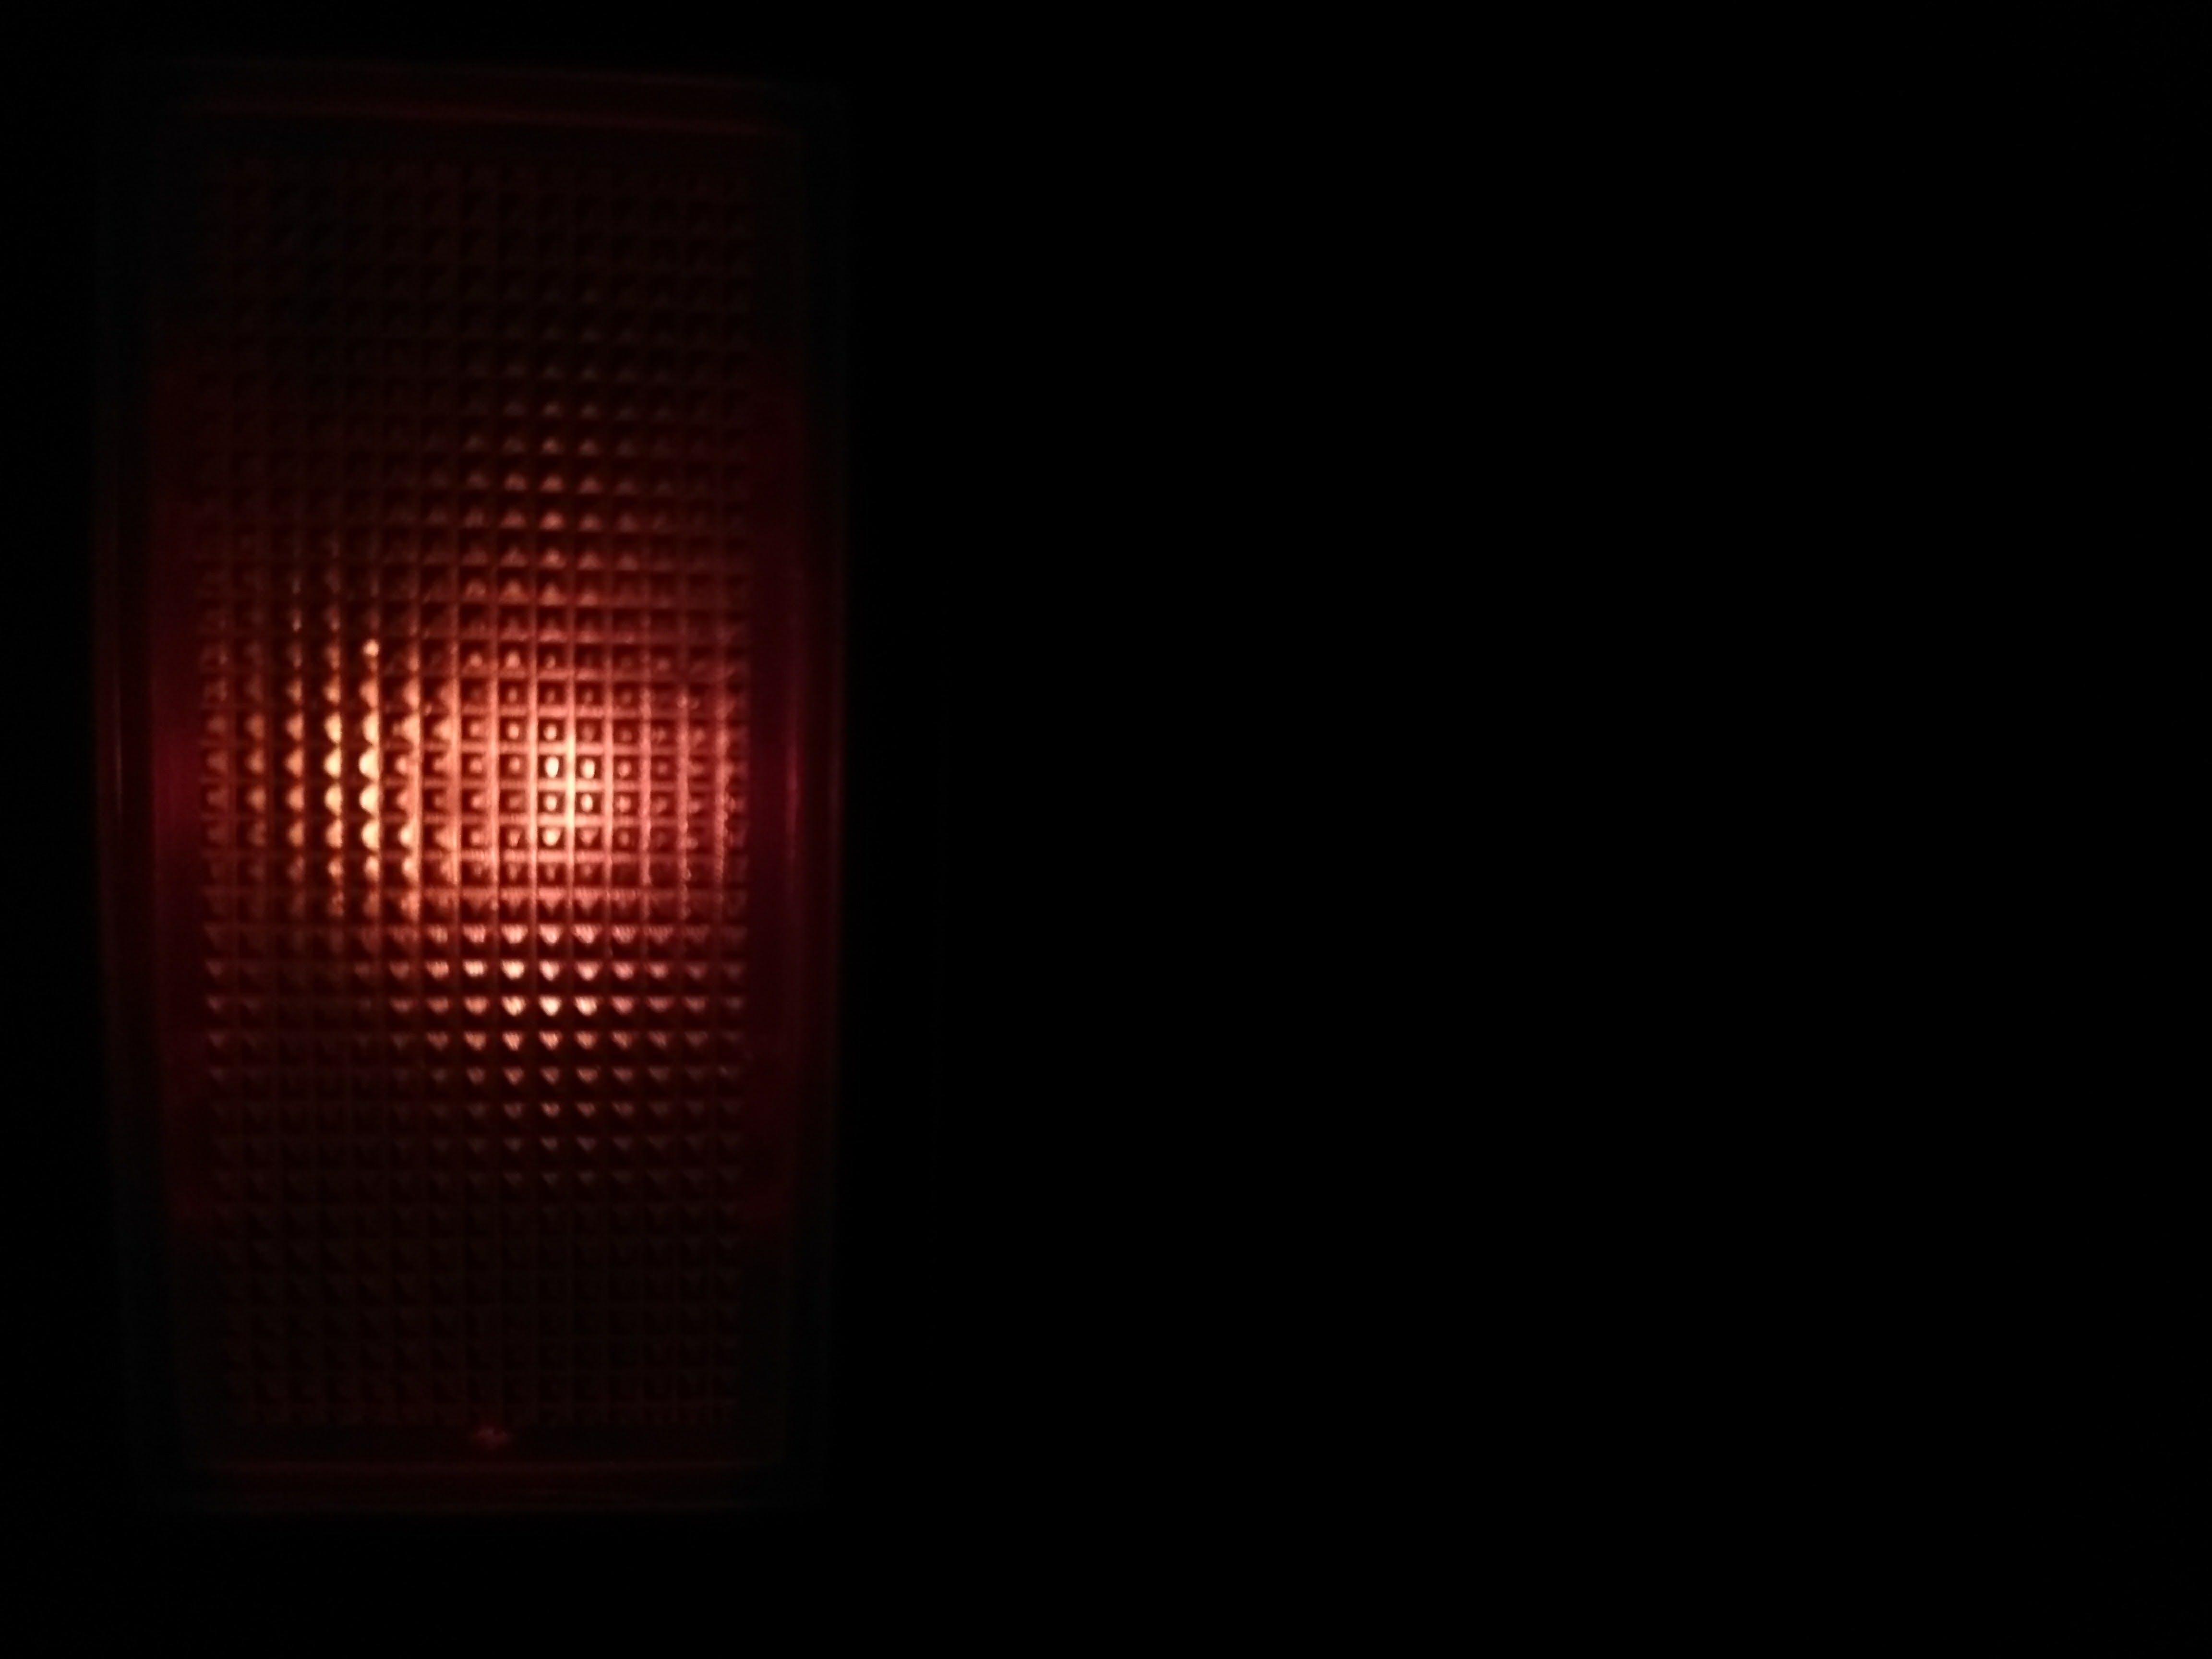 Free stock photo of background, black, dark, electricity